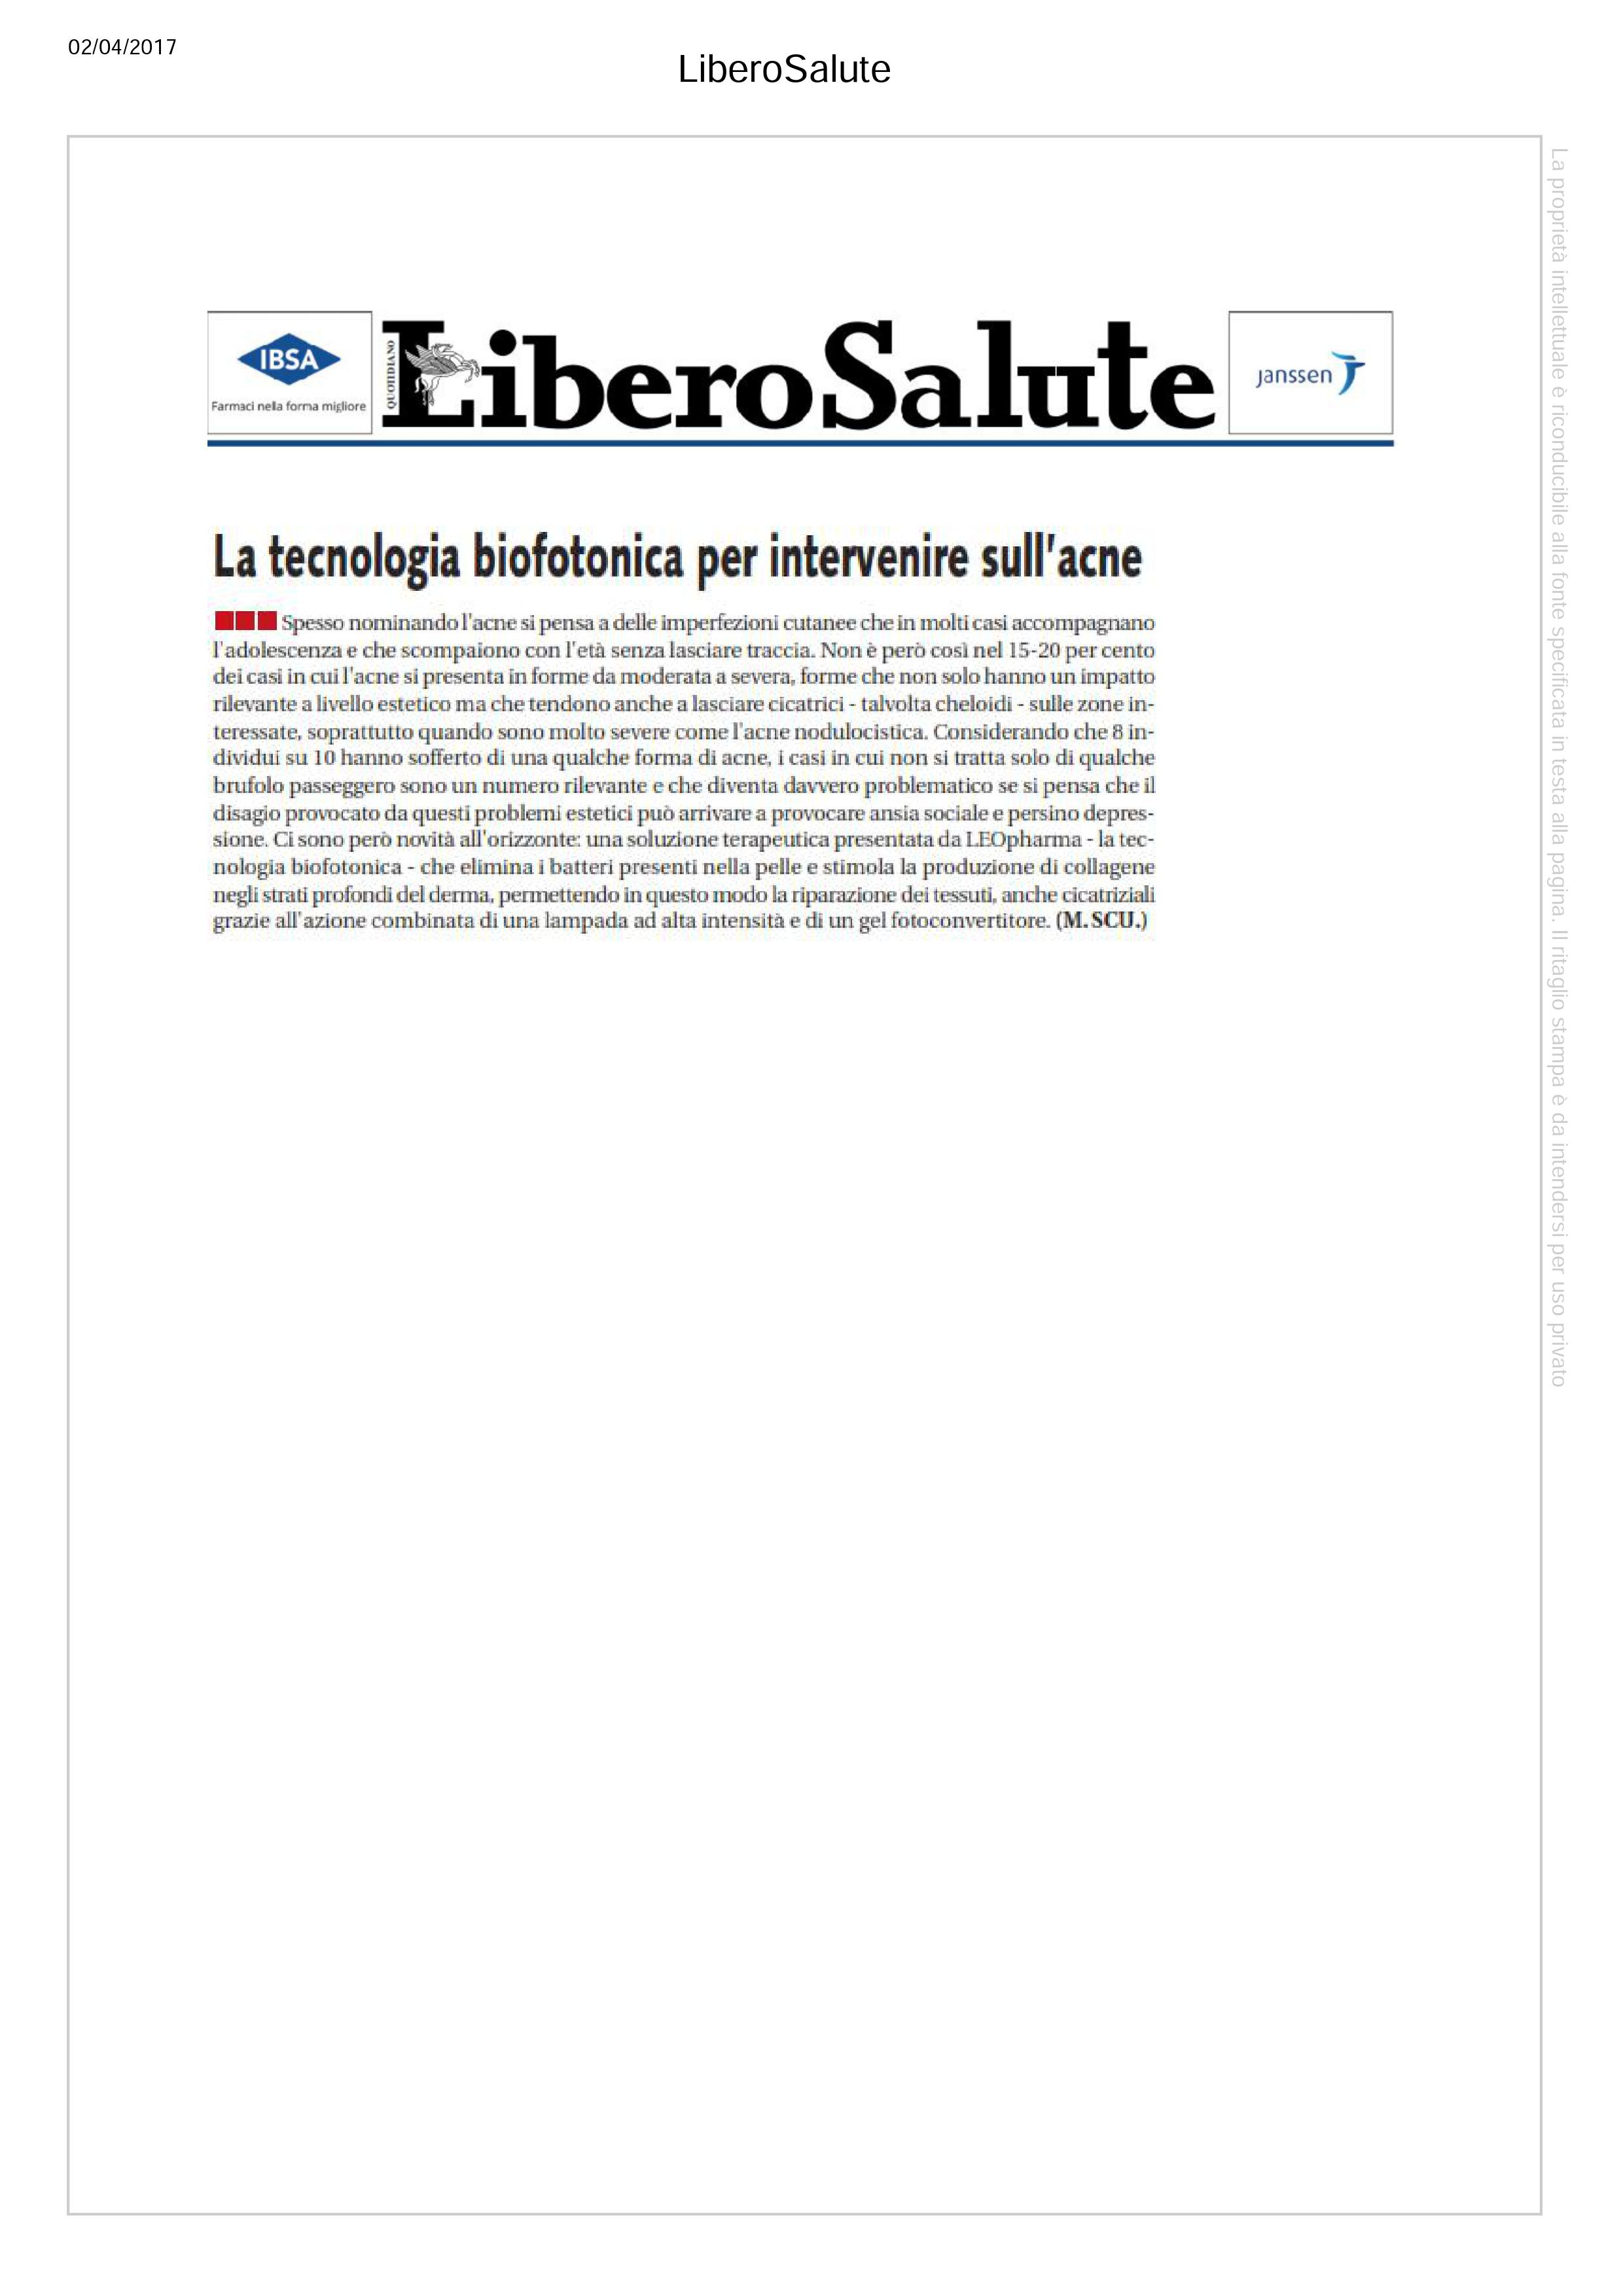 liber020417